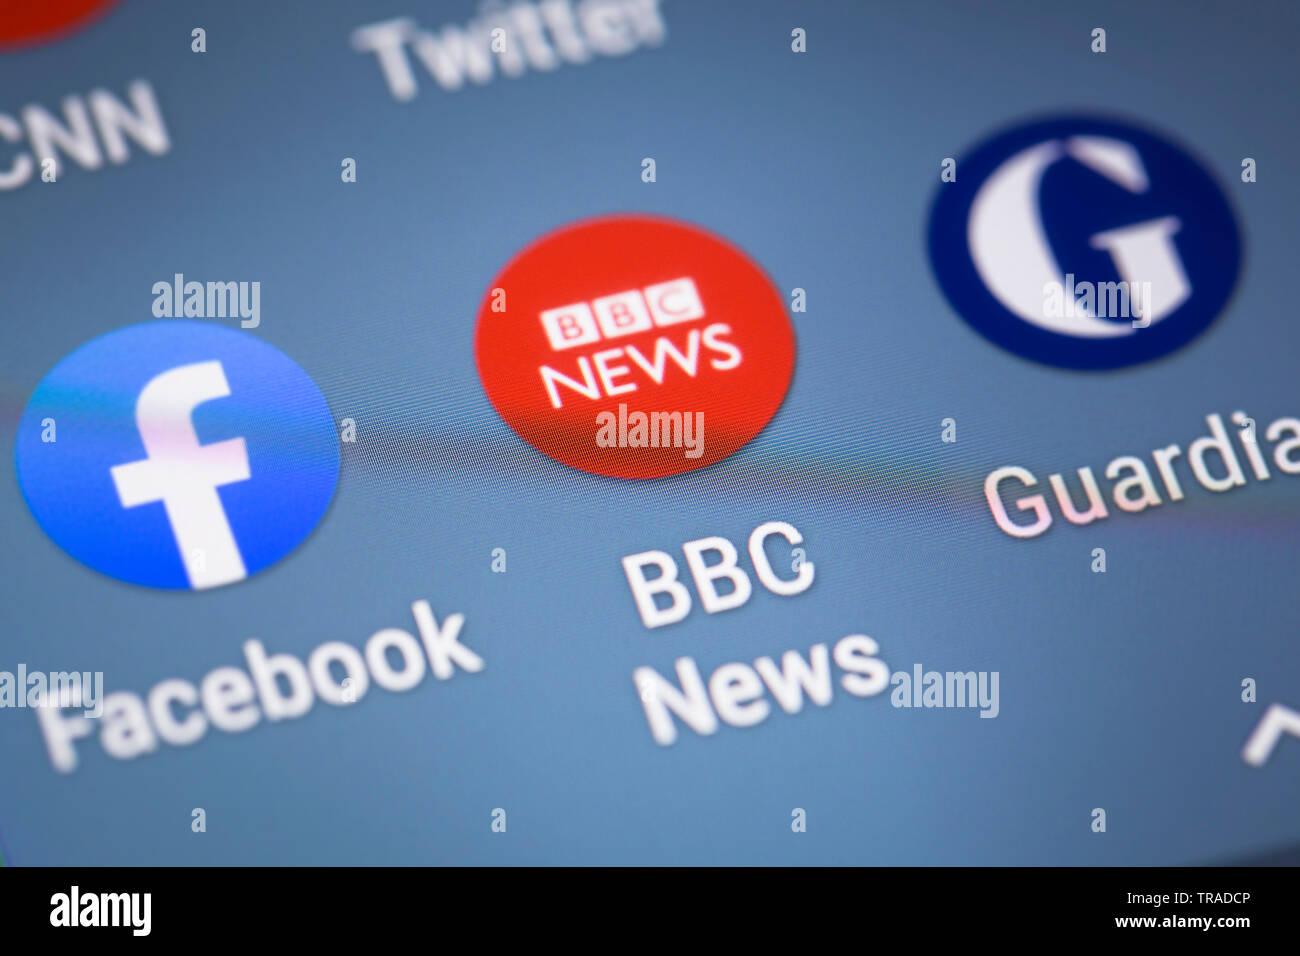 BBC news logo icon on mobile phone screen Stock Photo